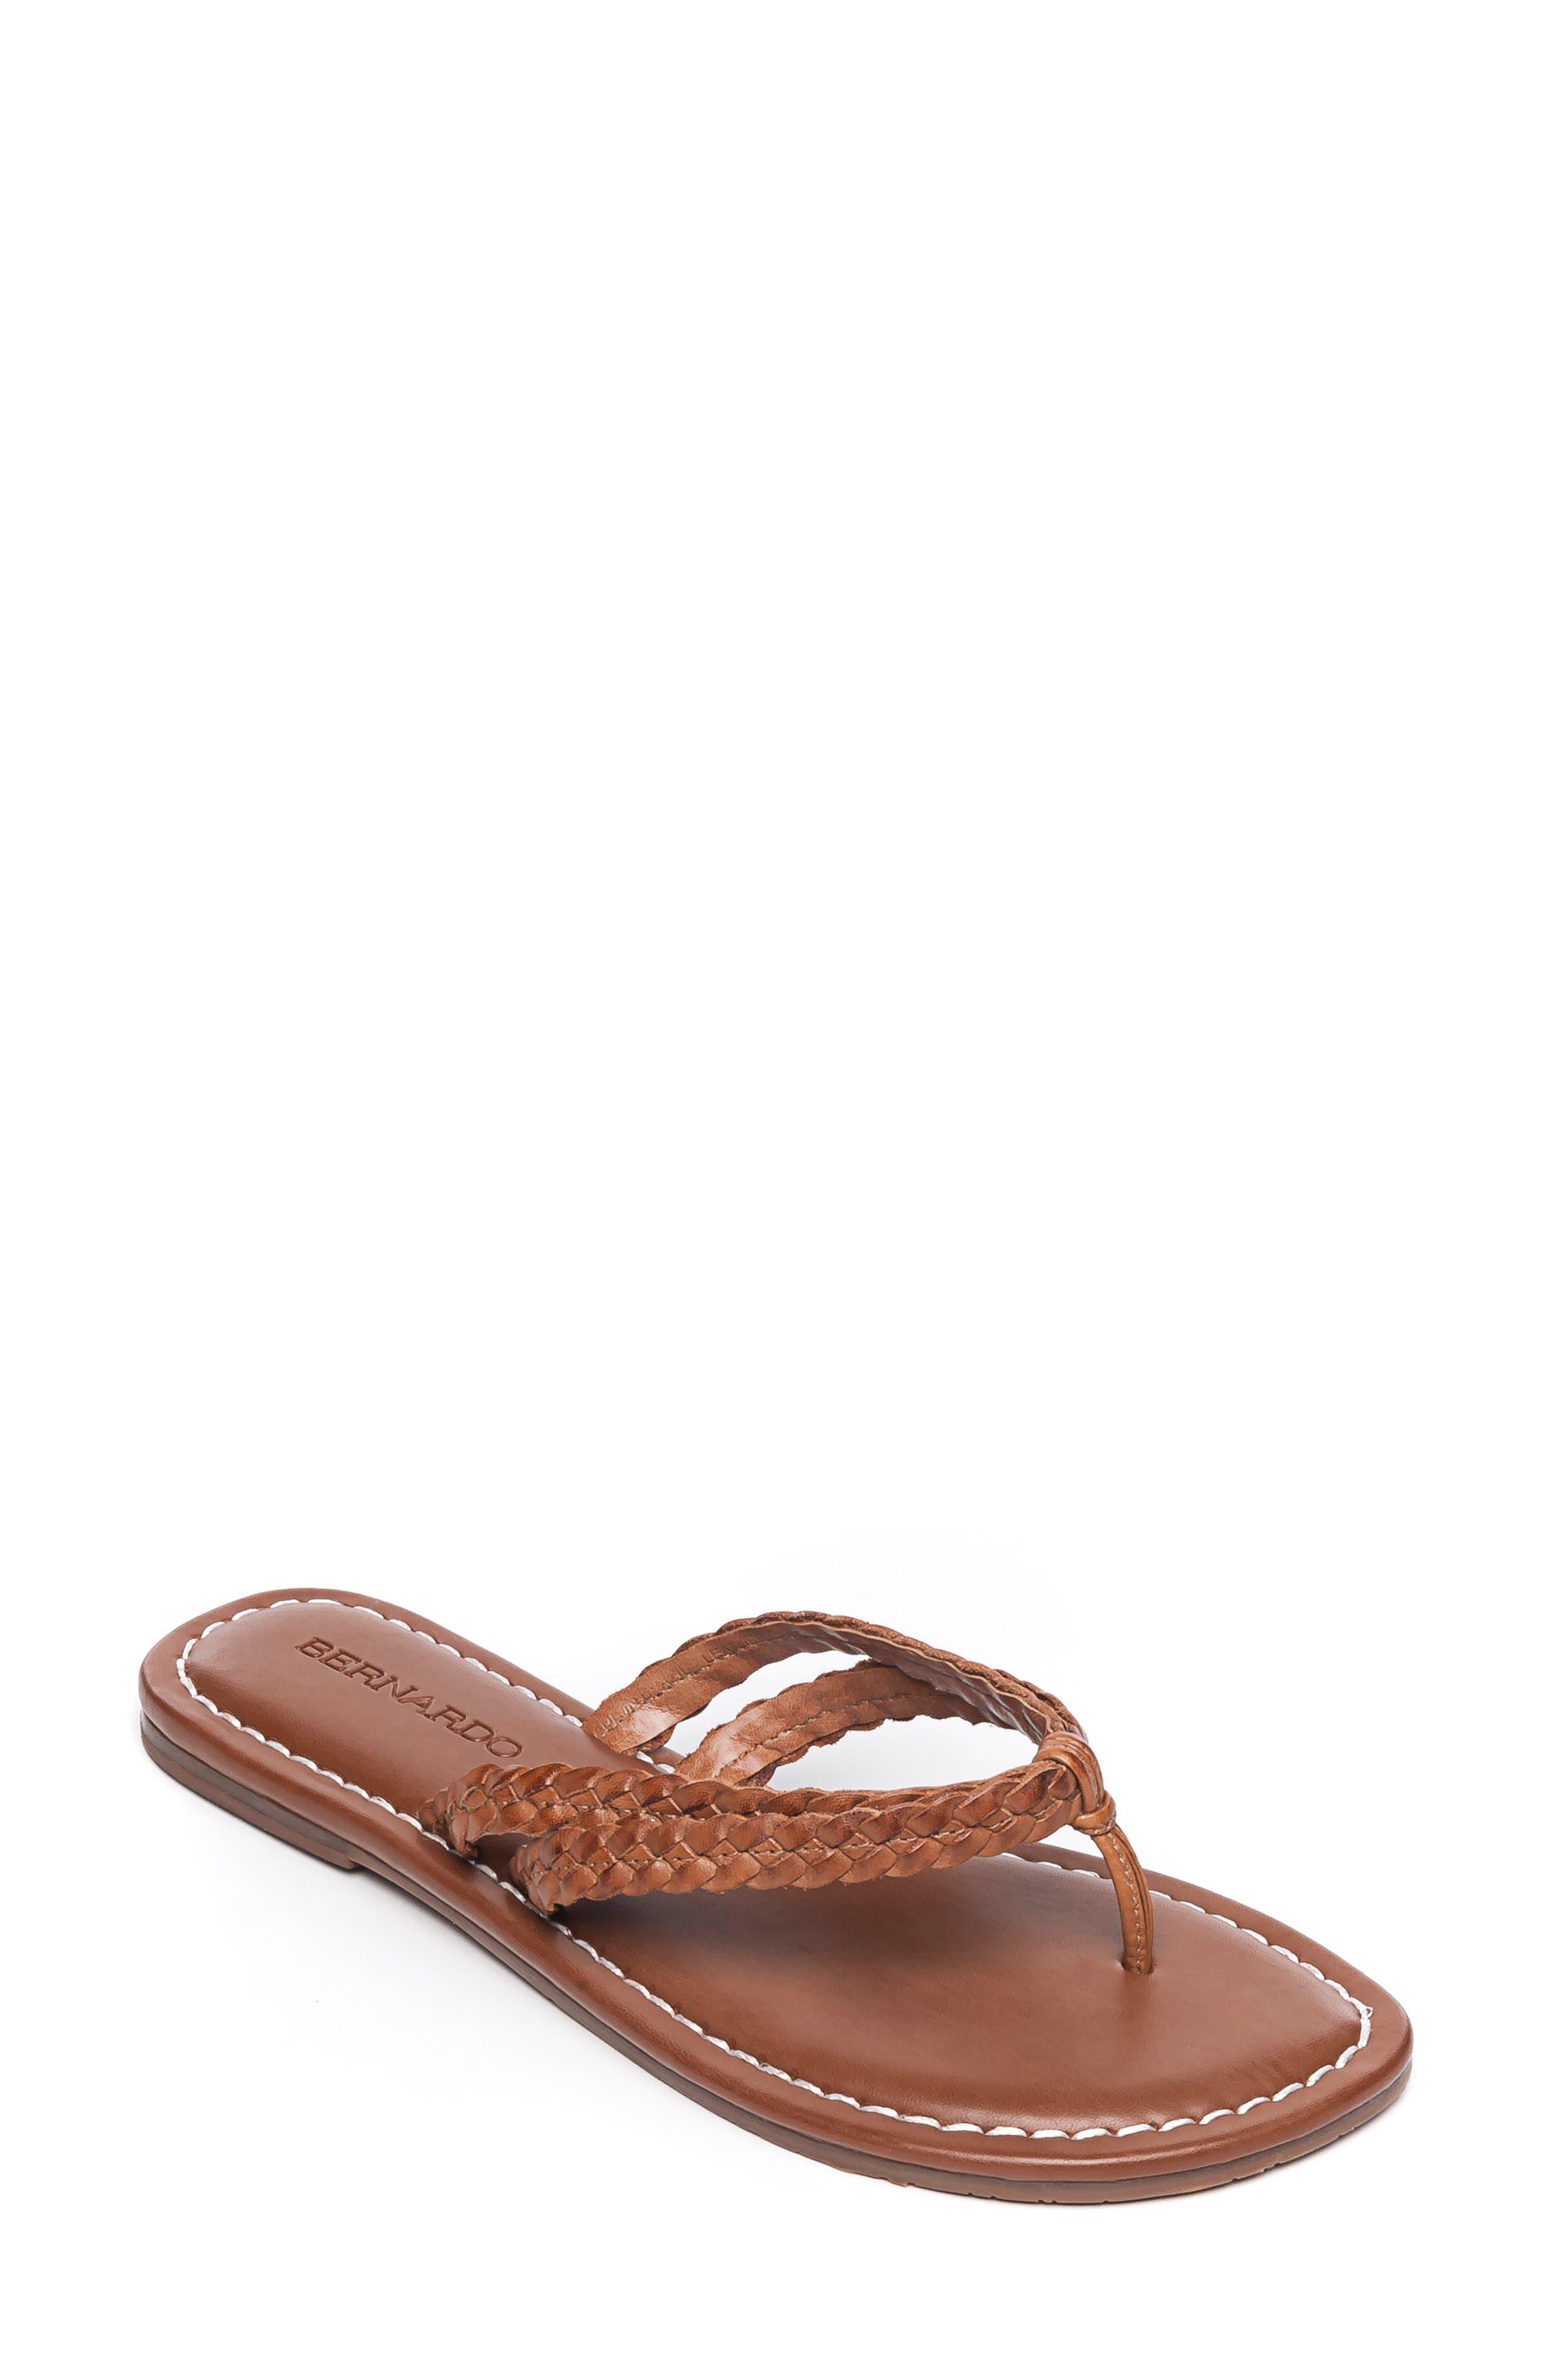 Bernardo Mariah Flip Flop, Brown